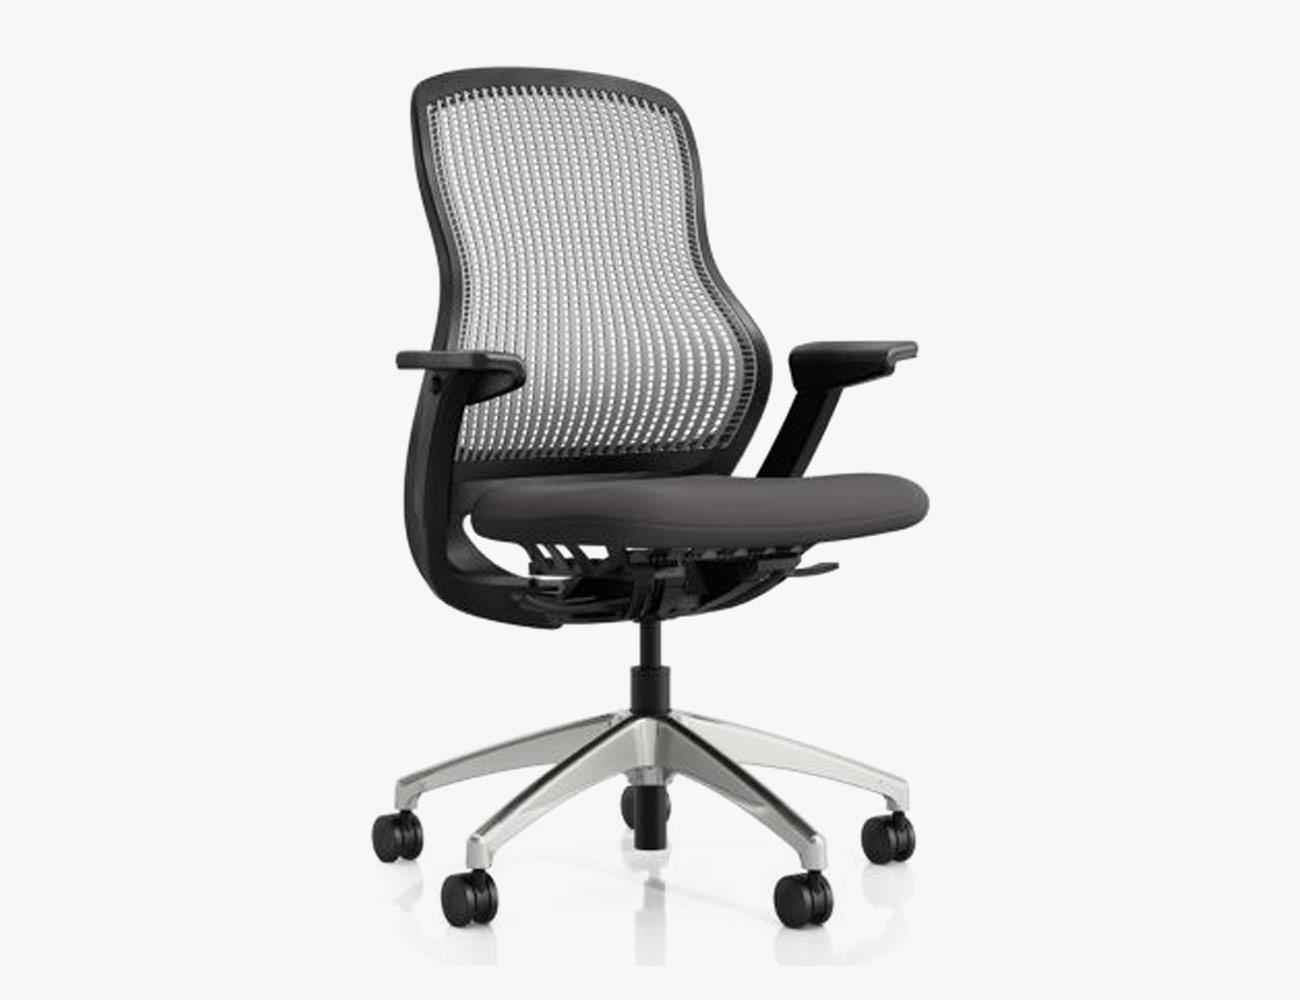 Best All-Around Office Chair: Knoll ReGeneration